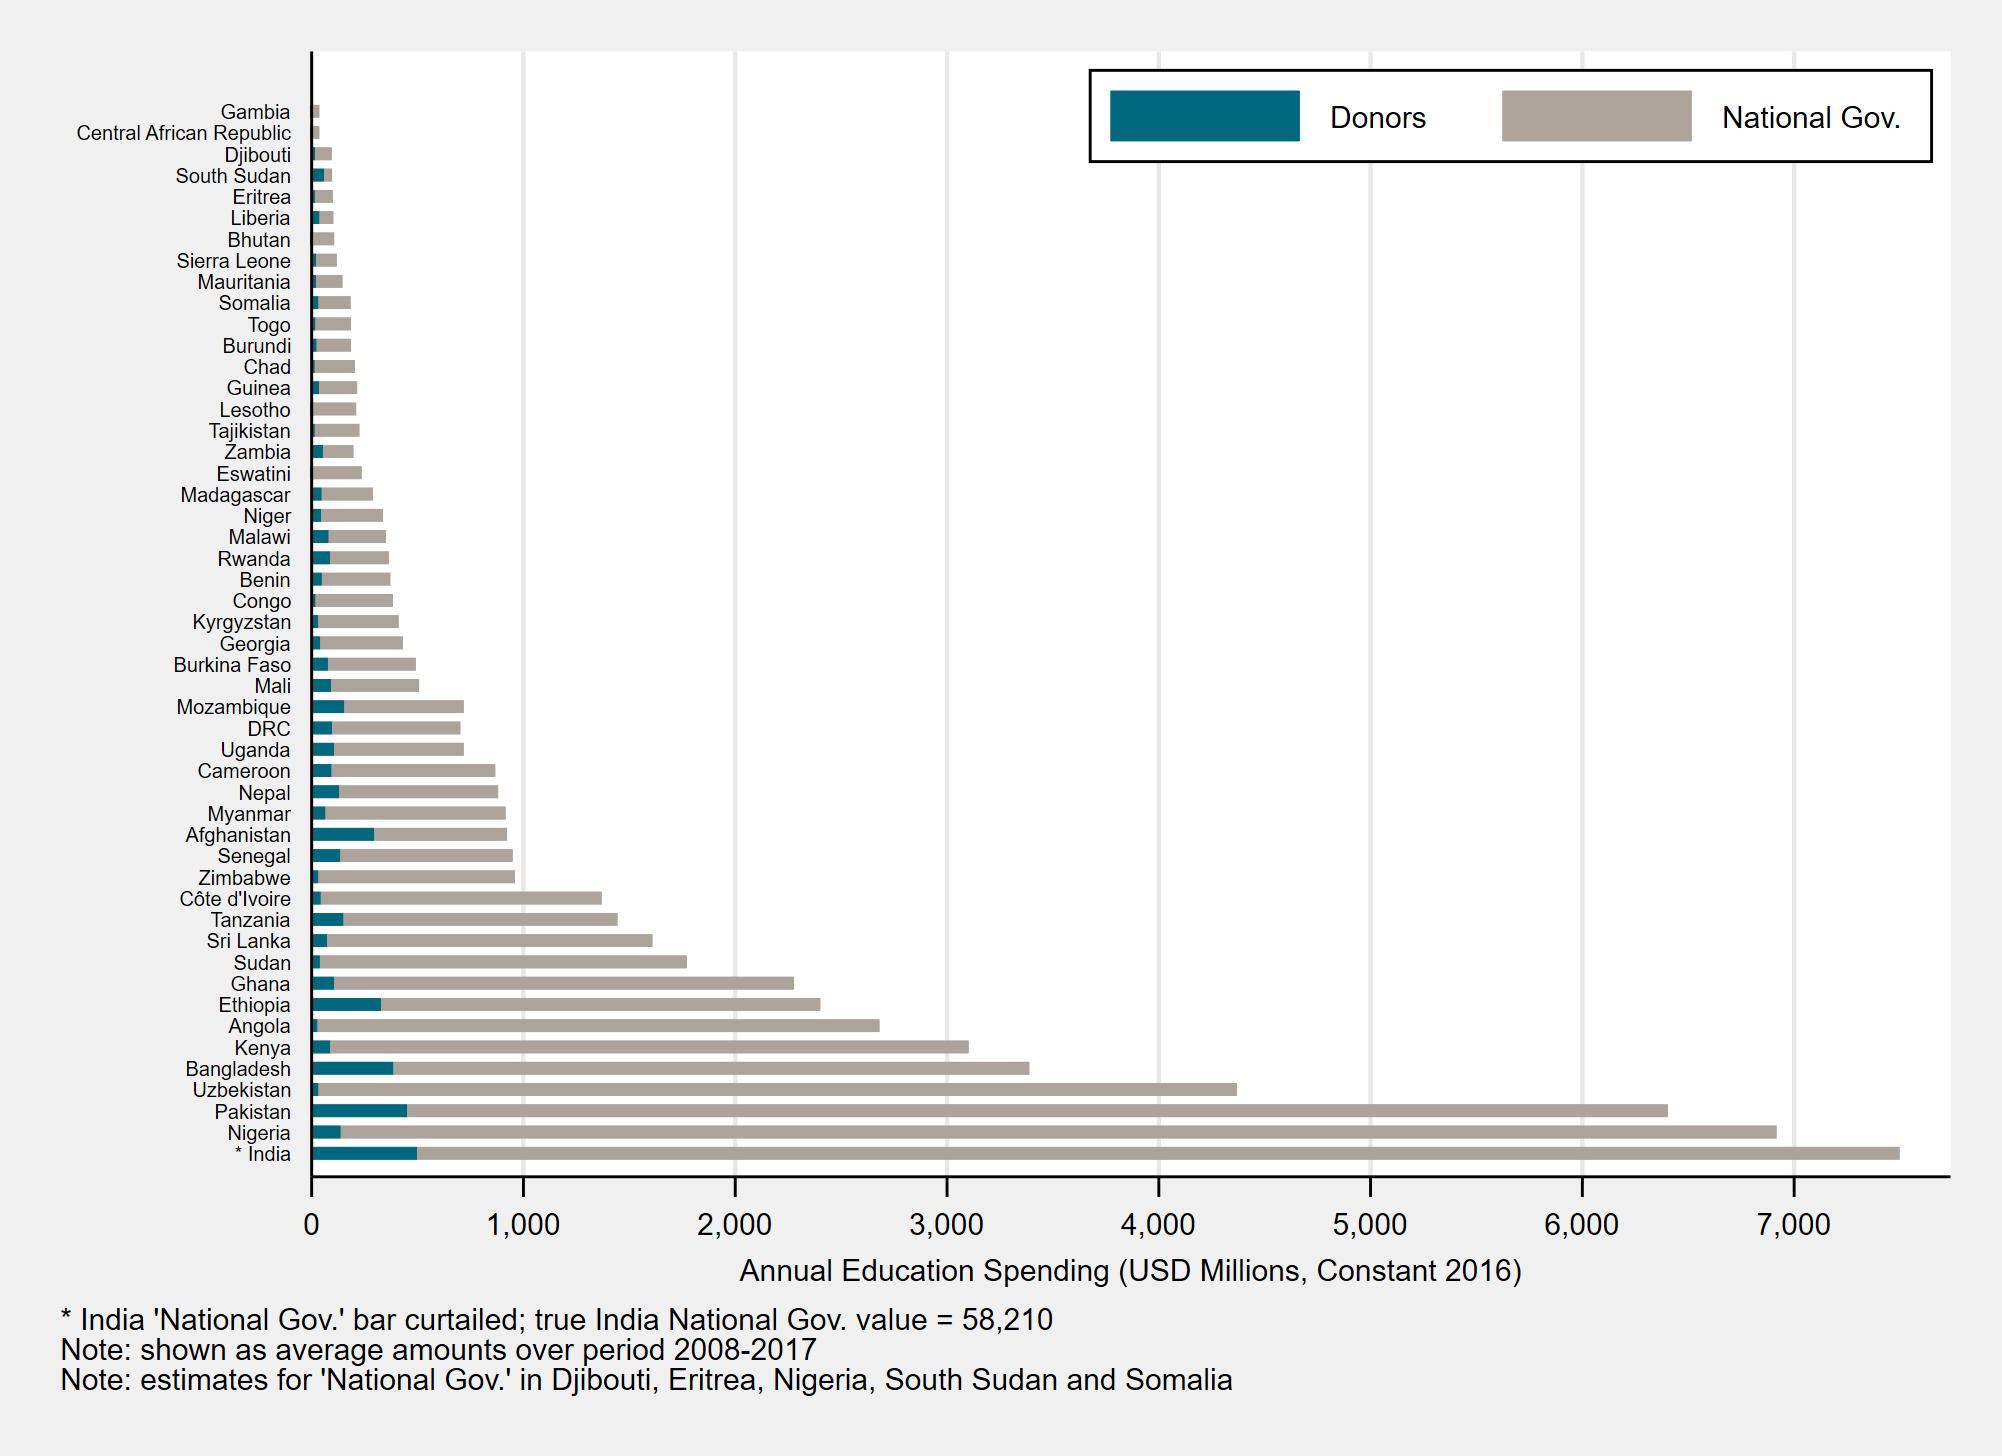 Domestic spending on education dwarfs education aid.